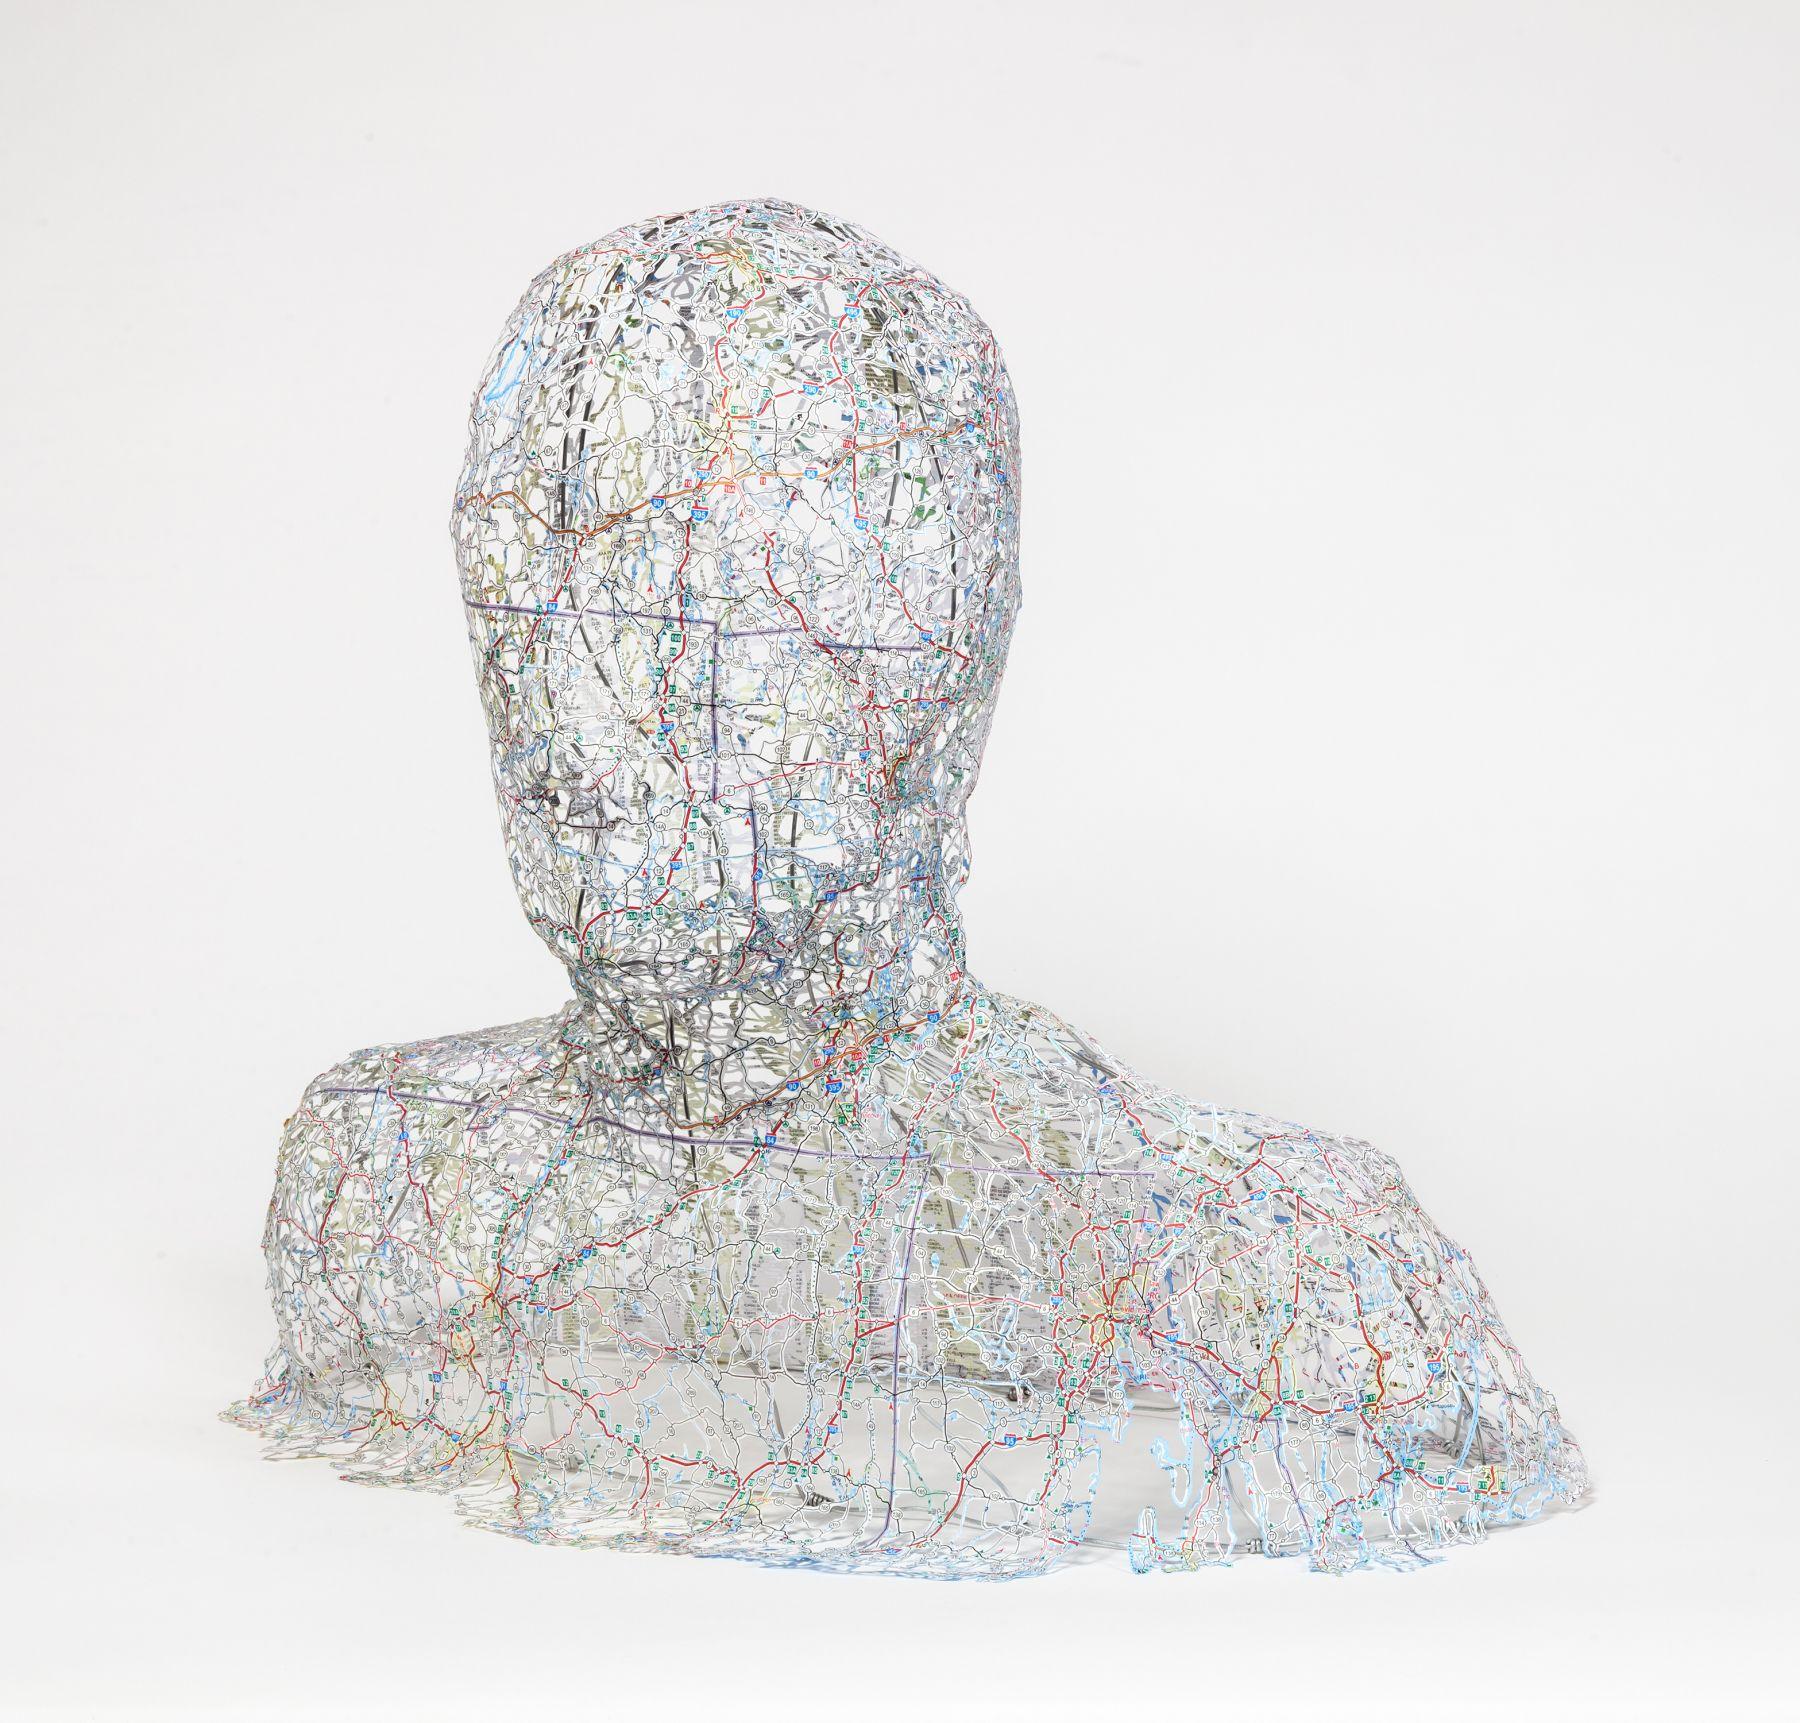 NIKKI ROSATO Untitled (Portrait), 2016